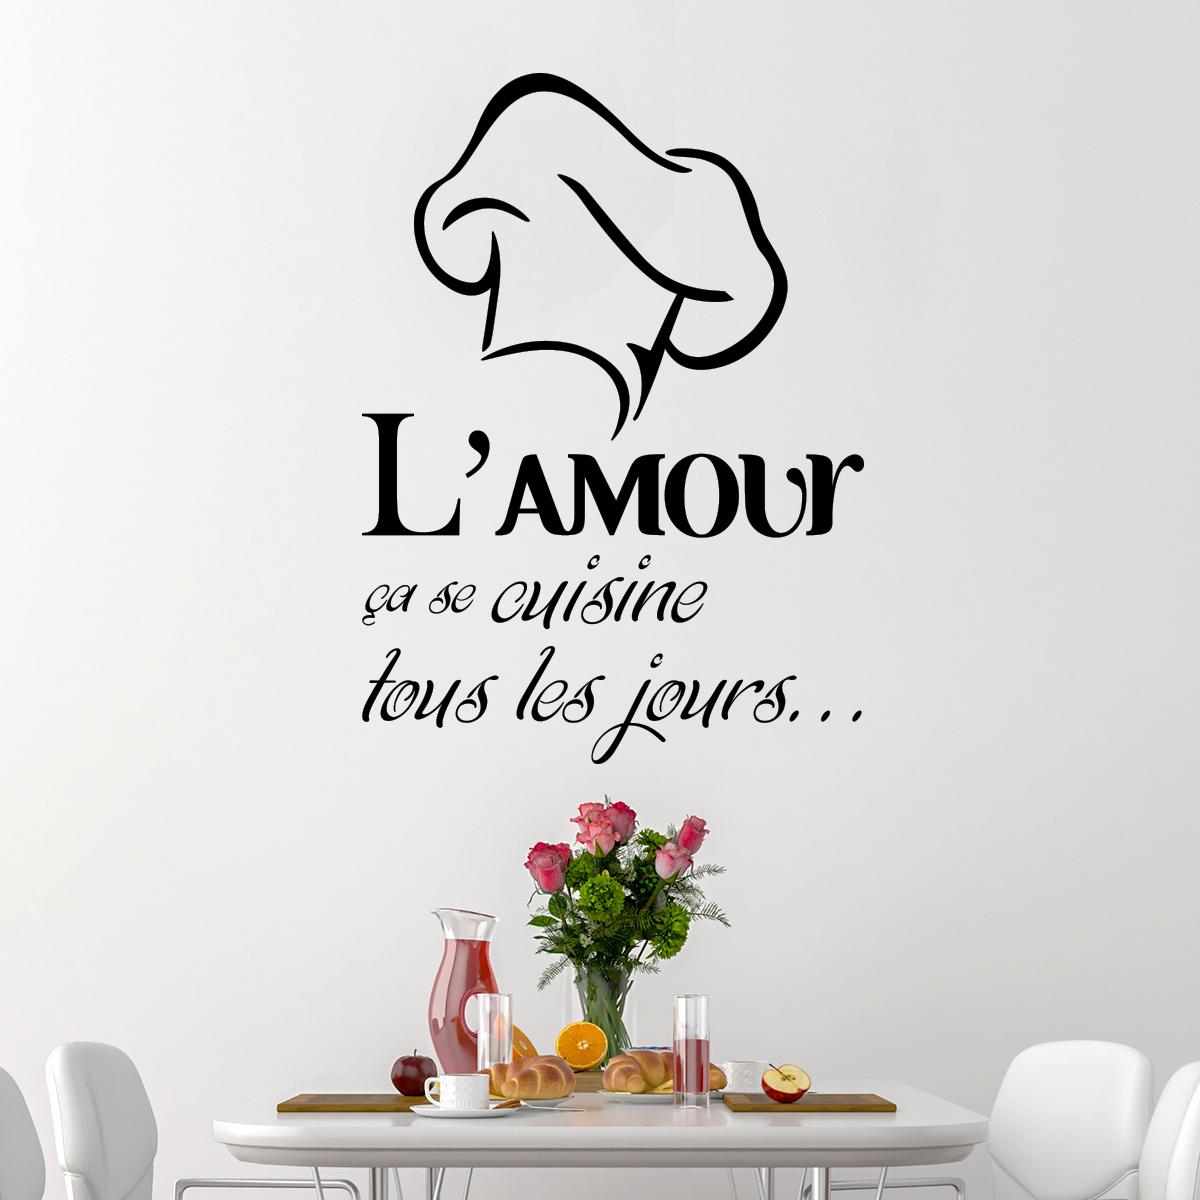 Sticker l amour a se cuisine stickers citations - Sticker mural cuisine ...